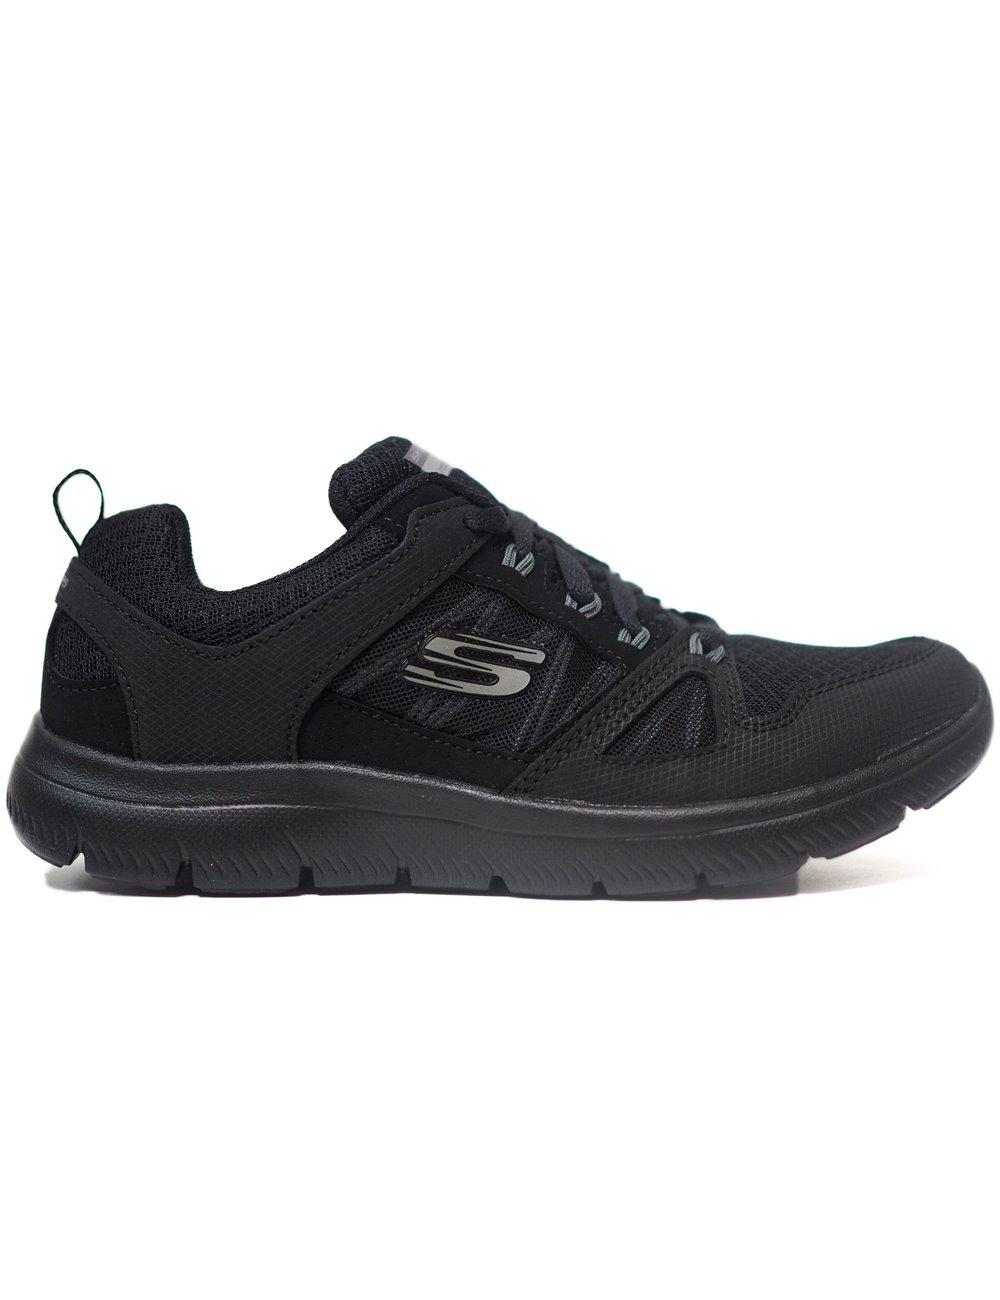 Zapatillas Skechers 12997 Negro